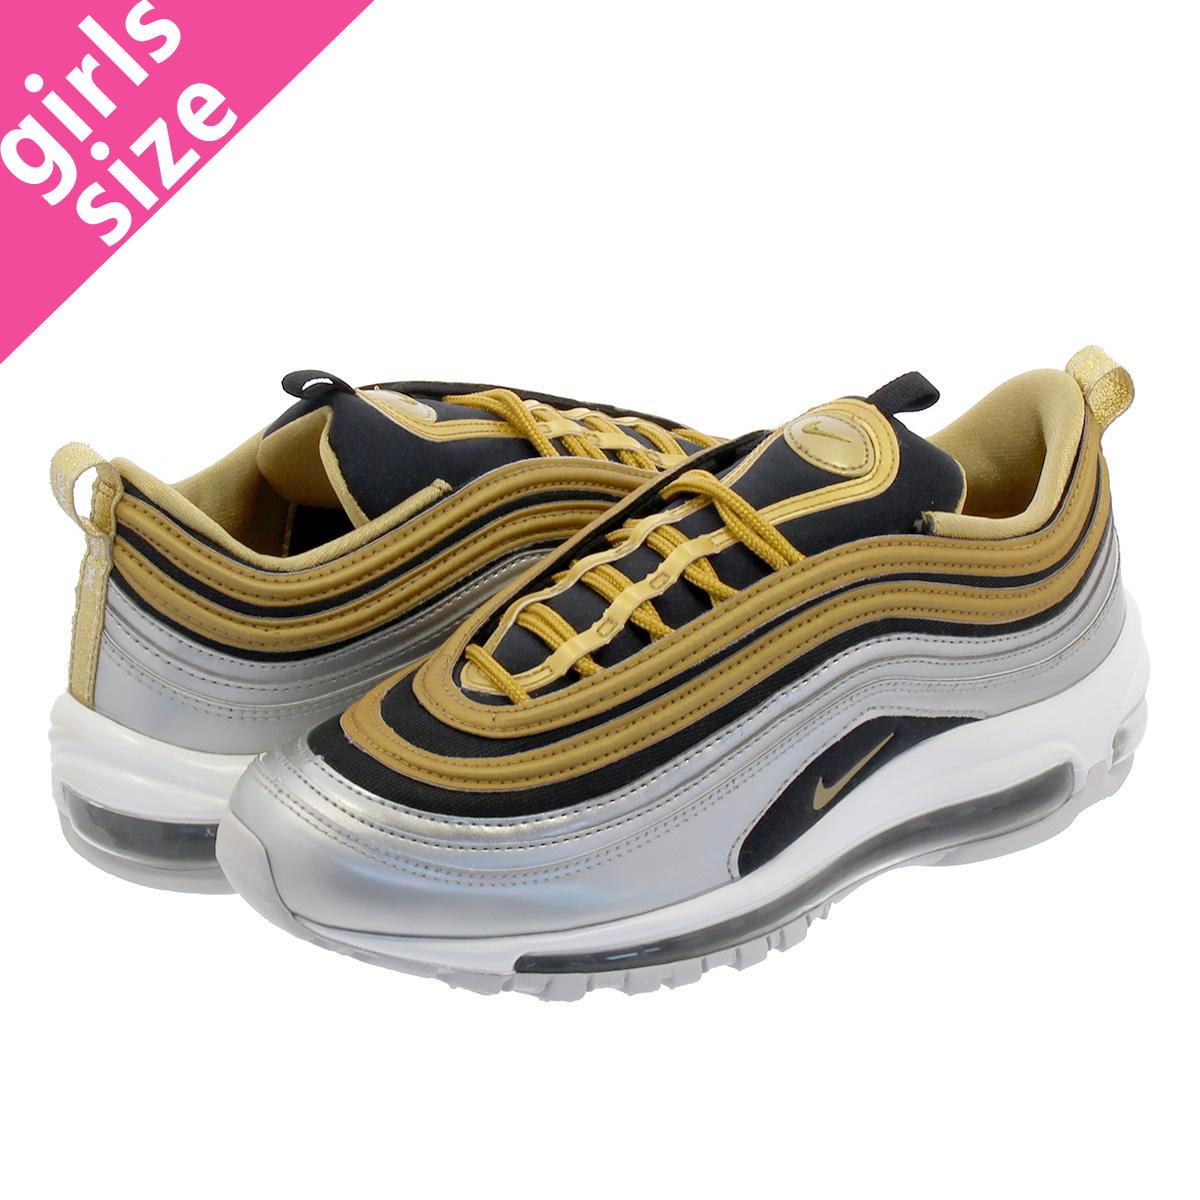 4c1ba05b49c NIKE WMNS AIR MAX 97 SE Nike women Air Max 97 SE METALLIC SILVER METALLIC  GOLD aq4137-700